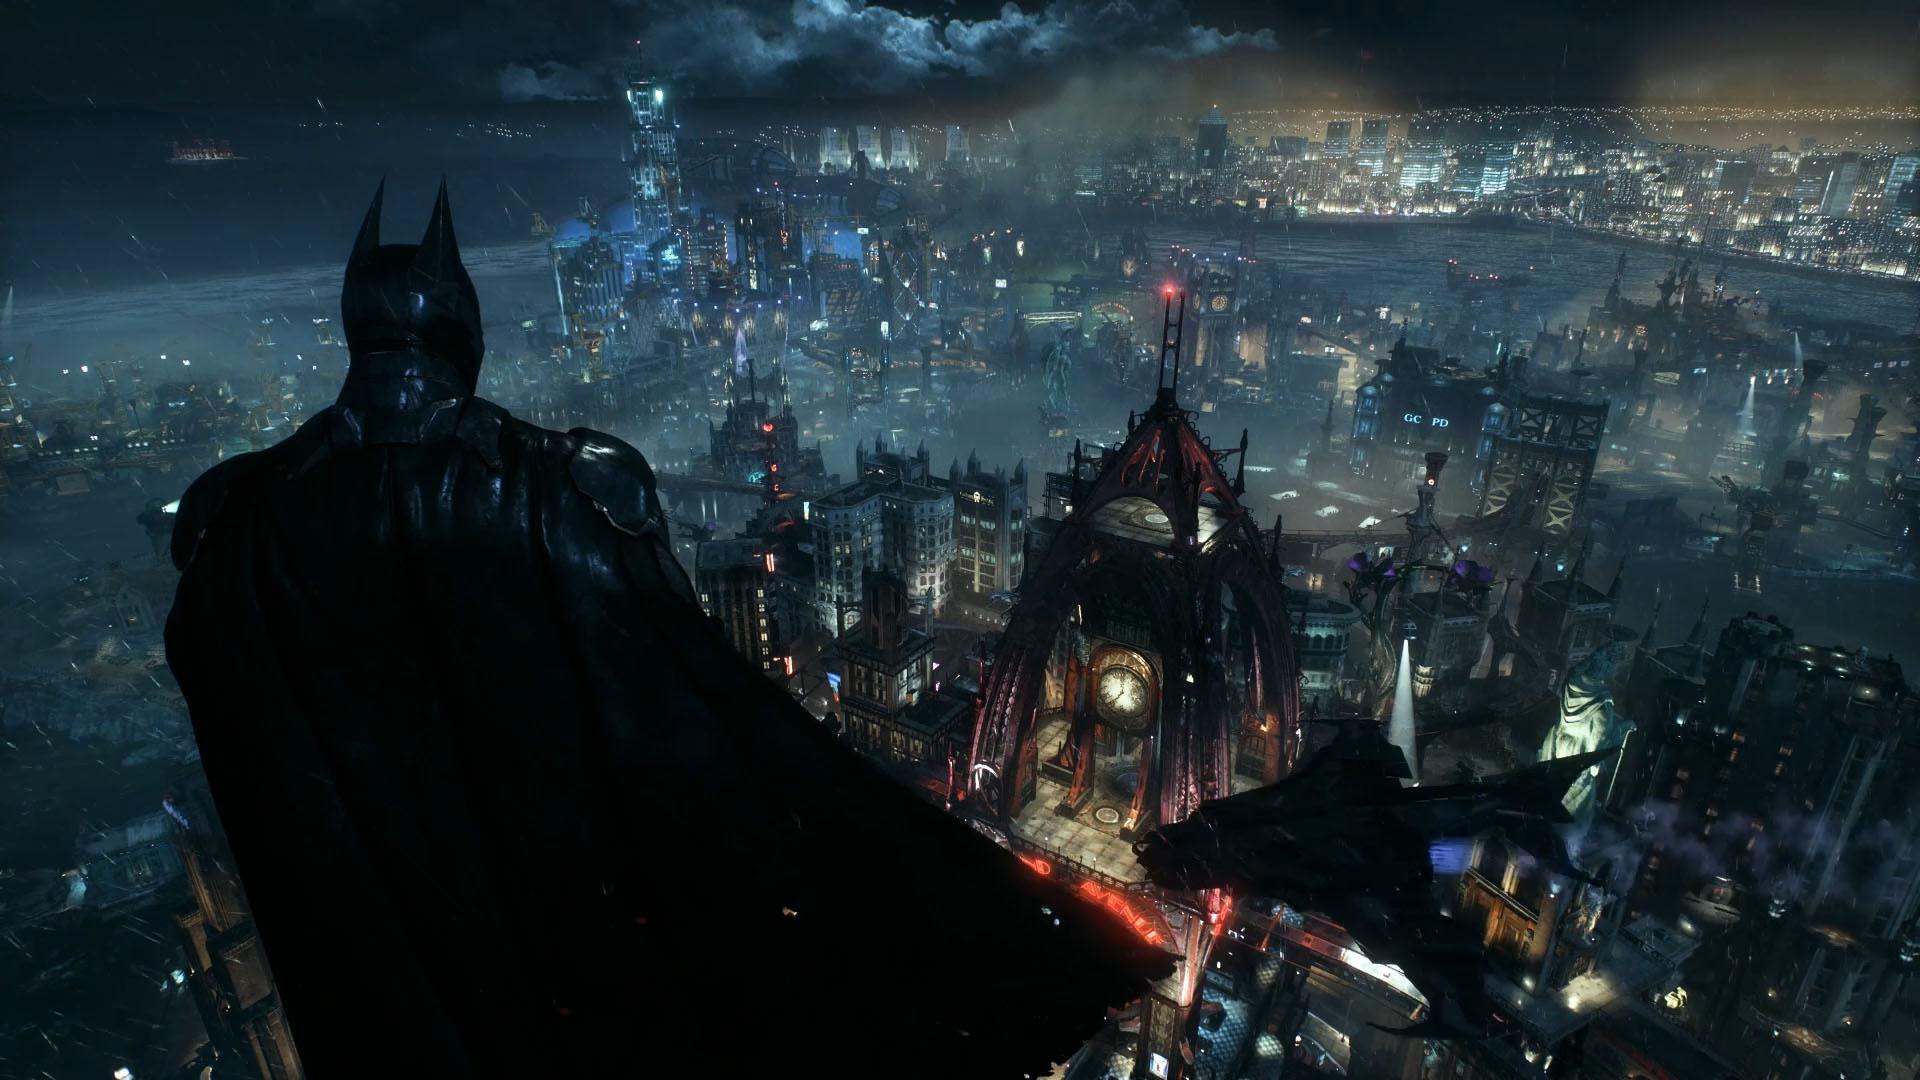 Wallpaper Engine - (Short) Batman Arkham Knight - Batman Overlooking Gotham from Wayne Tower